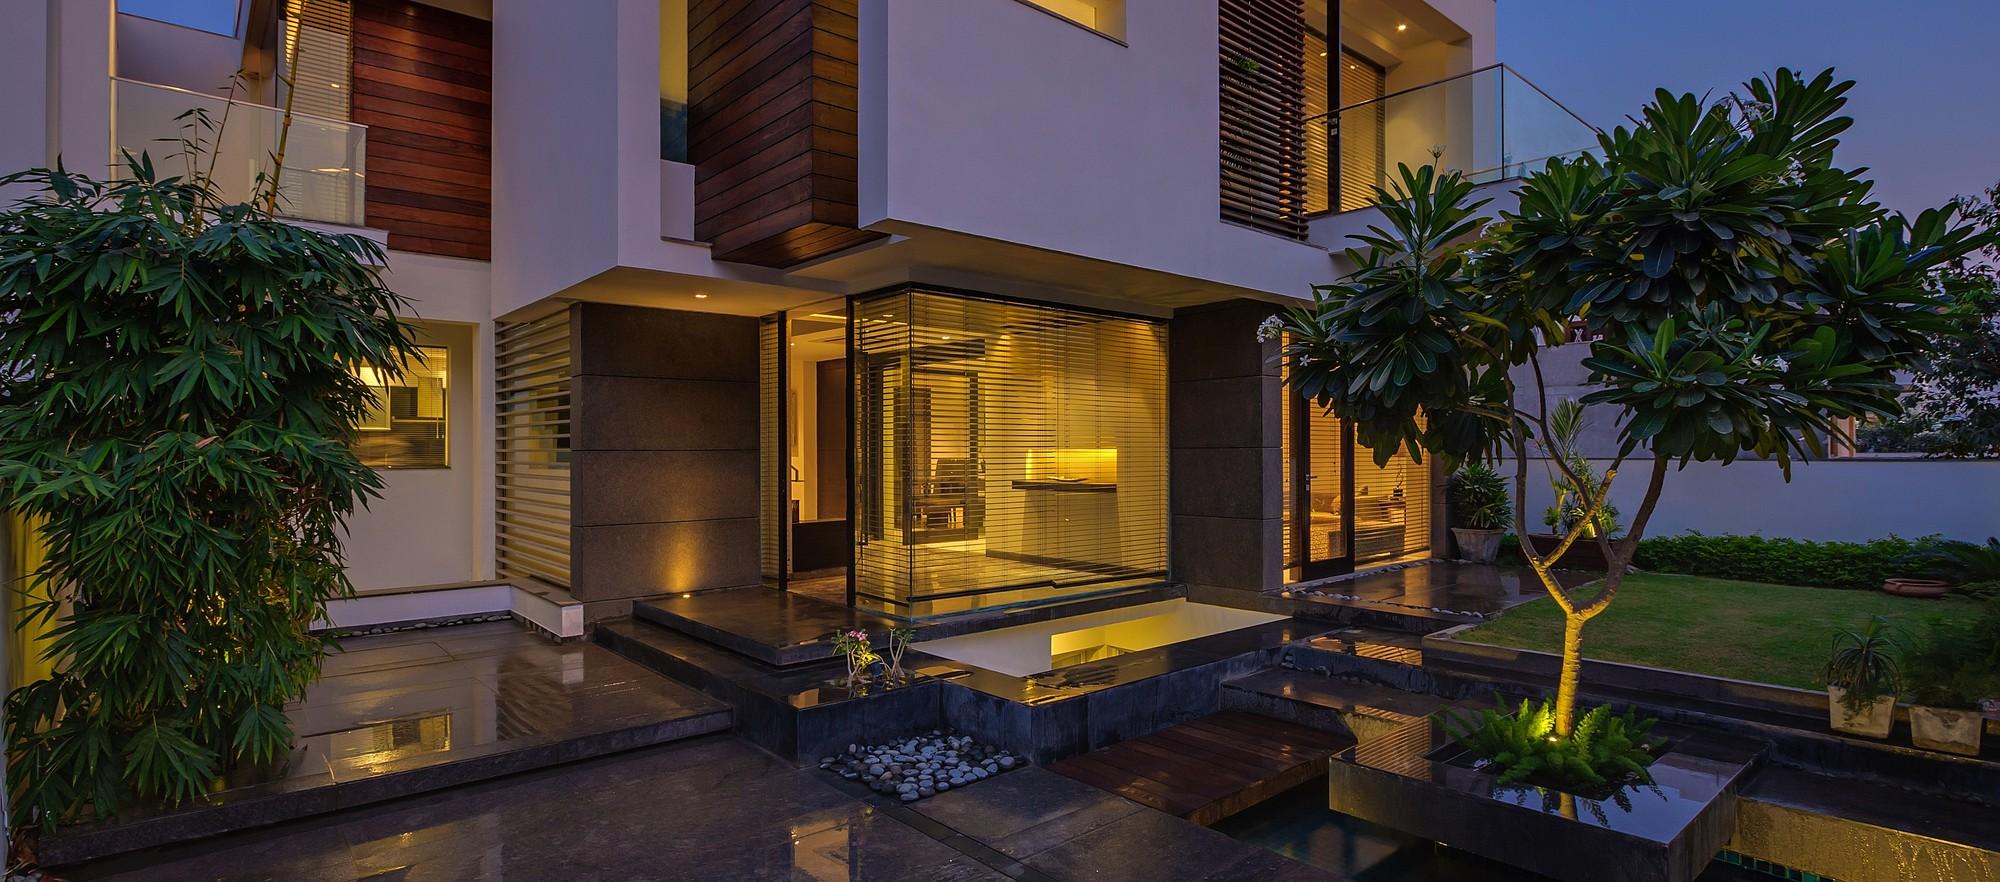 The Overhang House / DADA & Partners